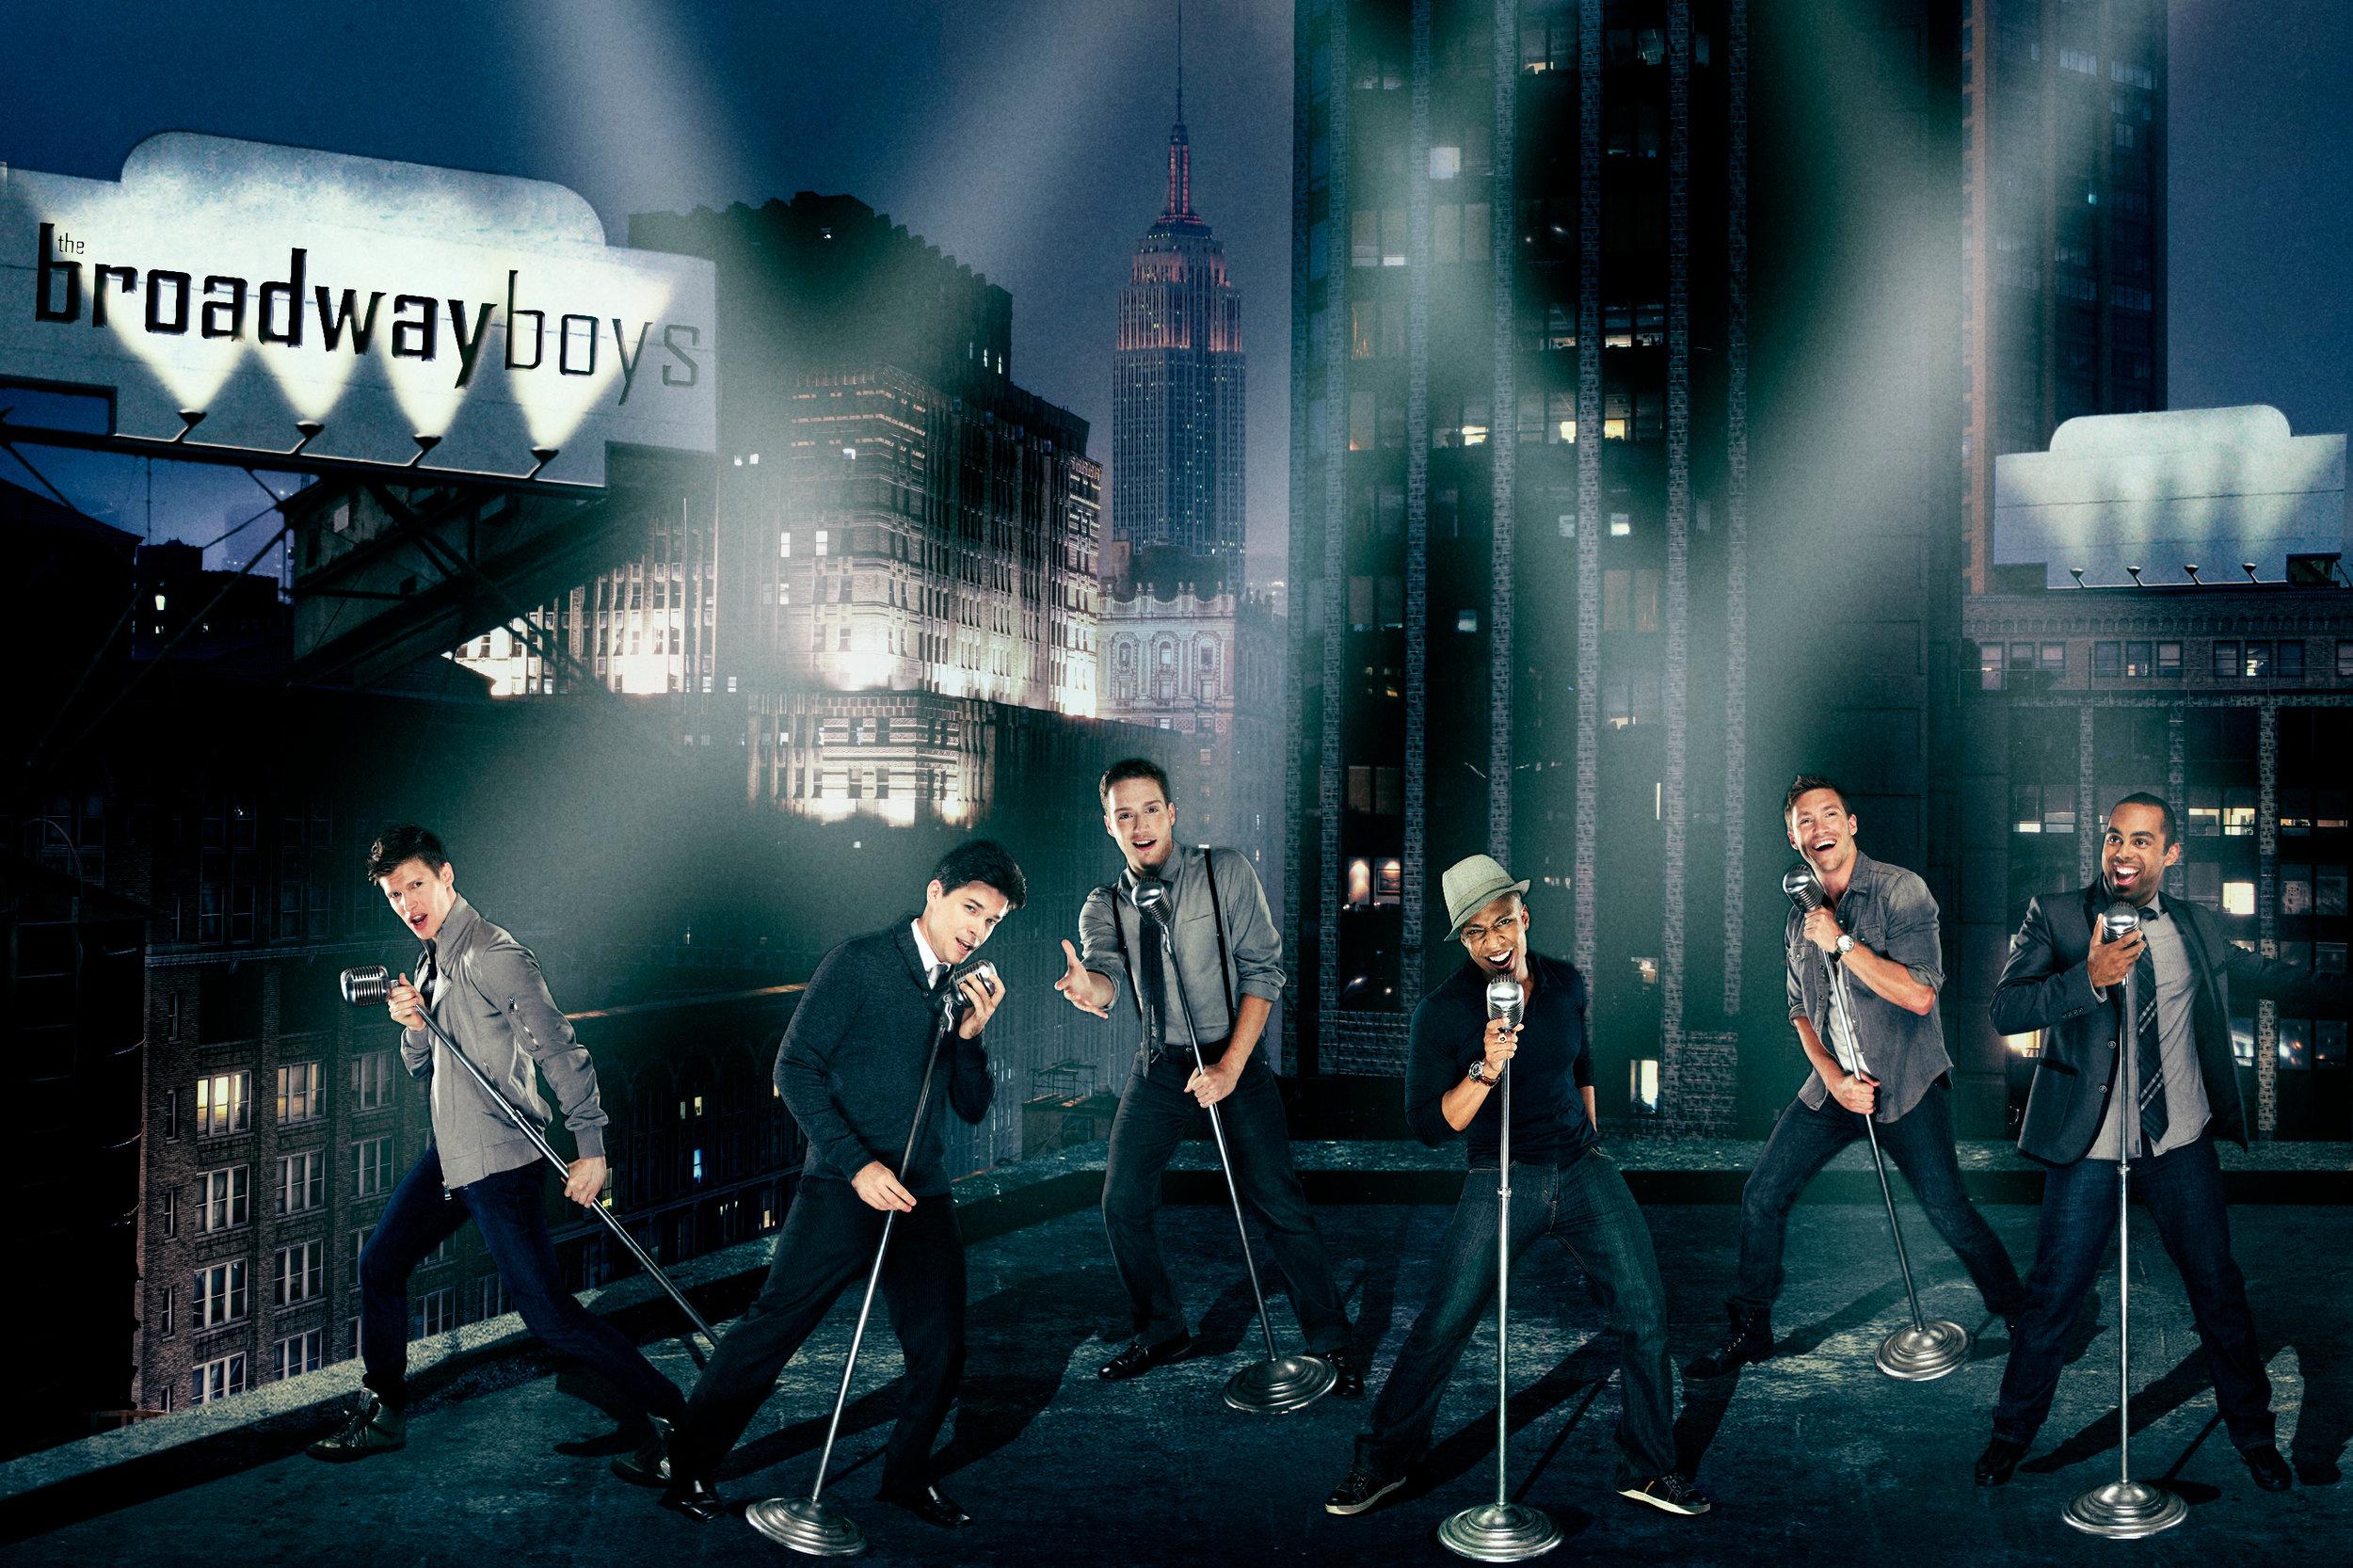 BwayBoy_spotlights.jpg